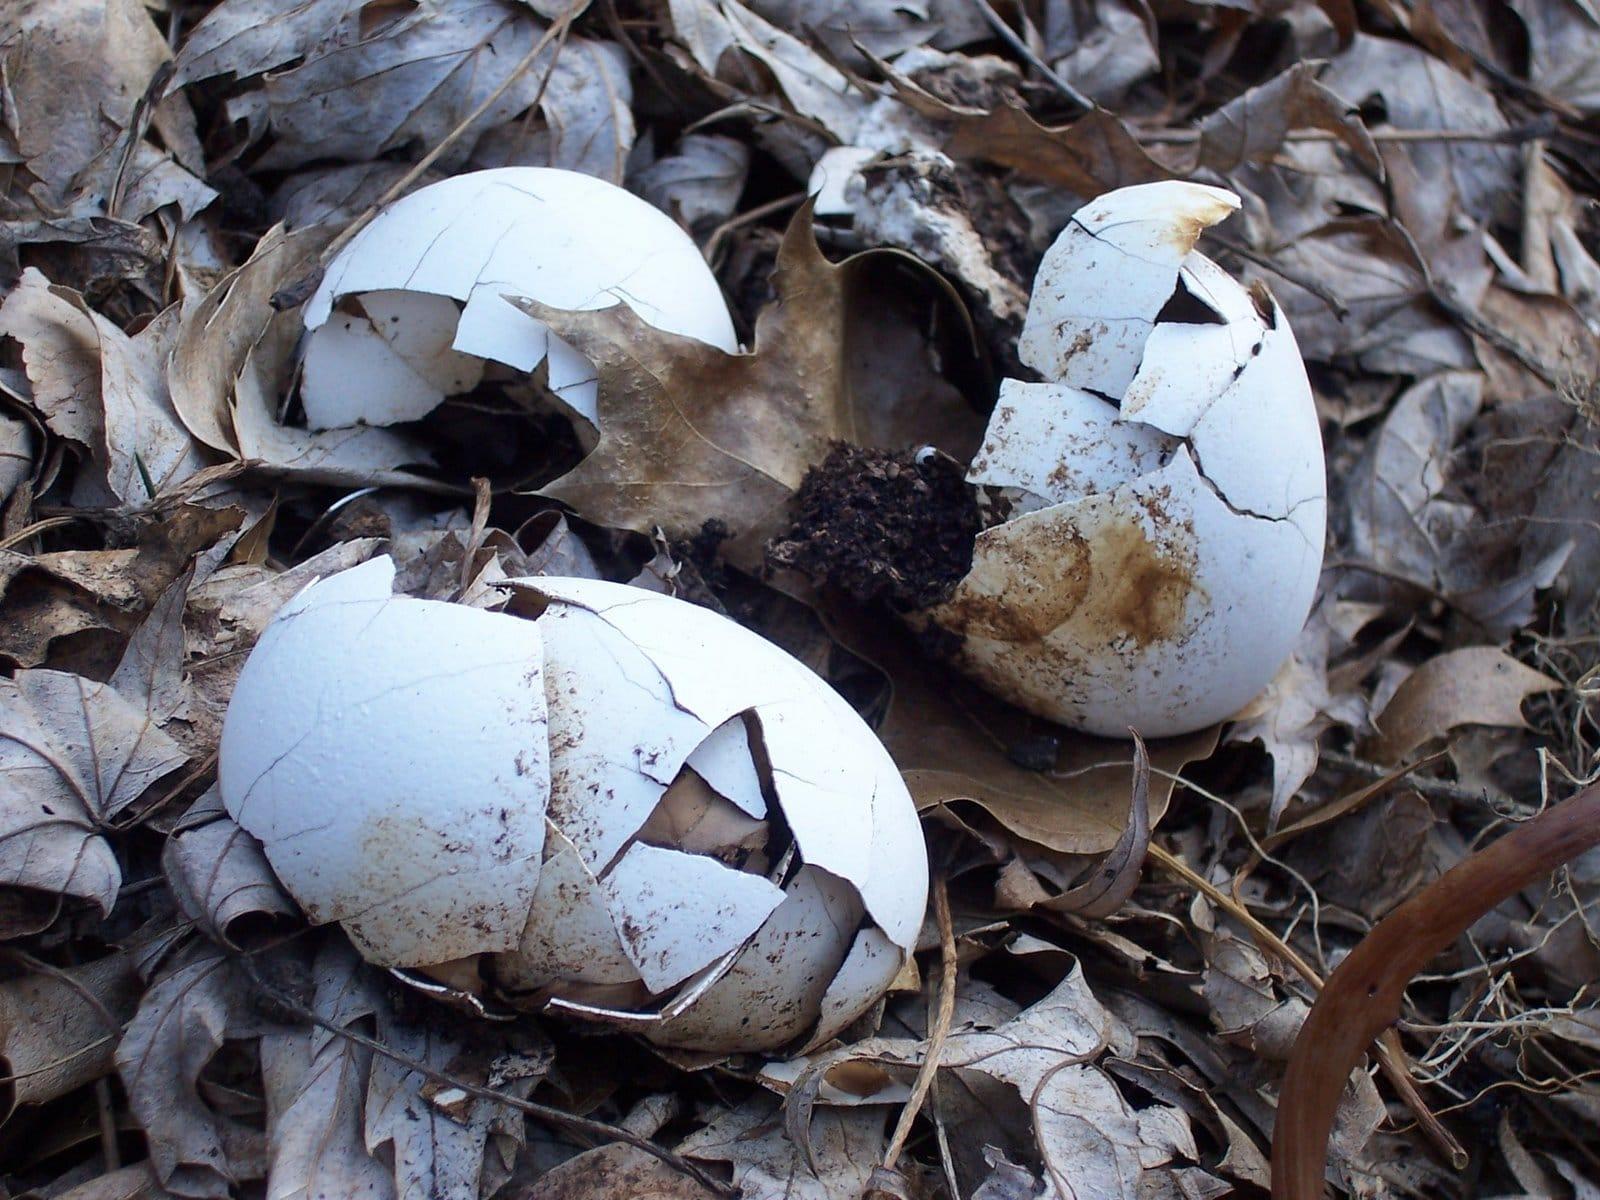 Composting Egg Shells